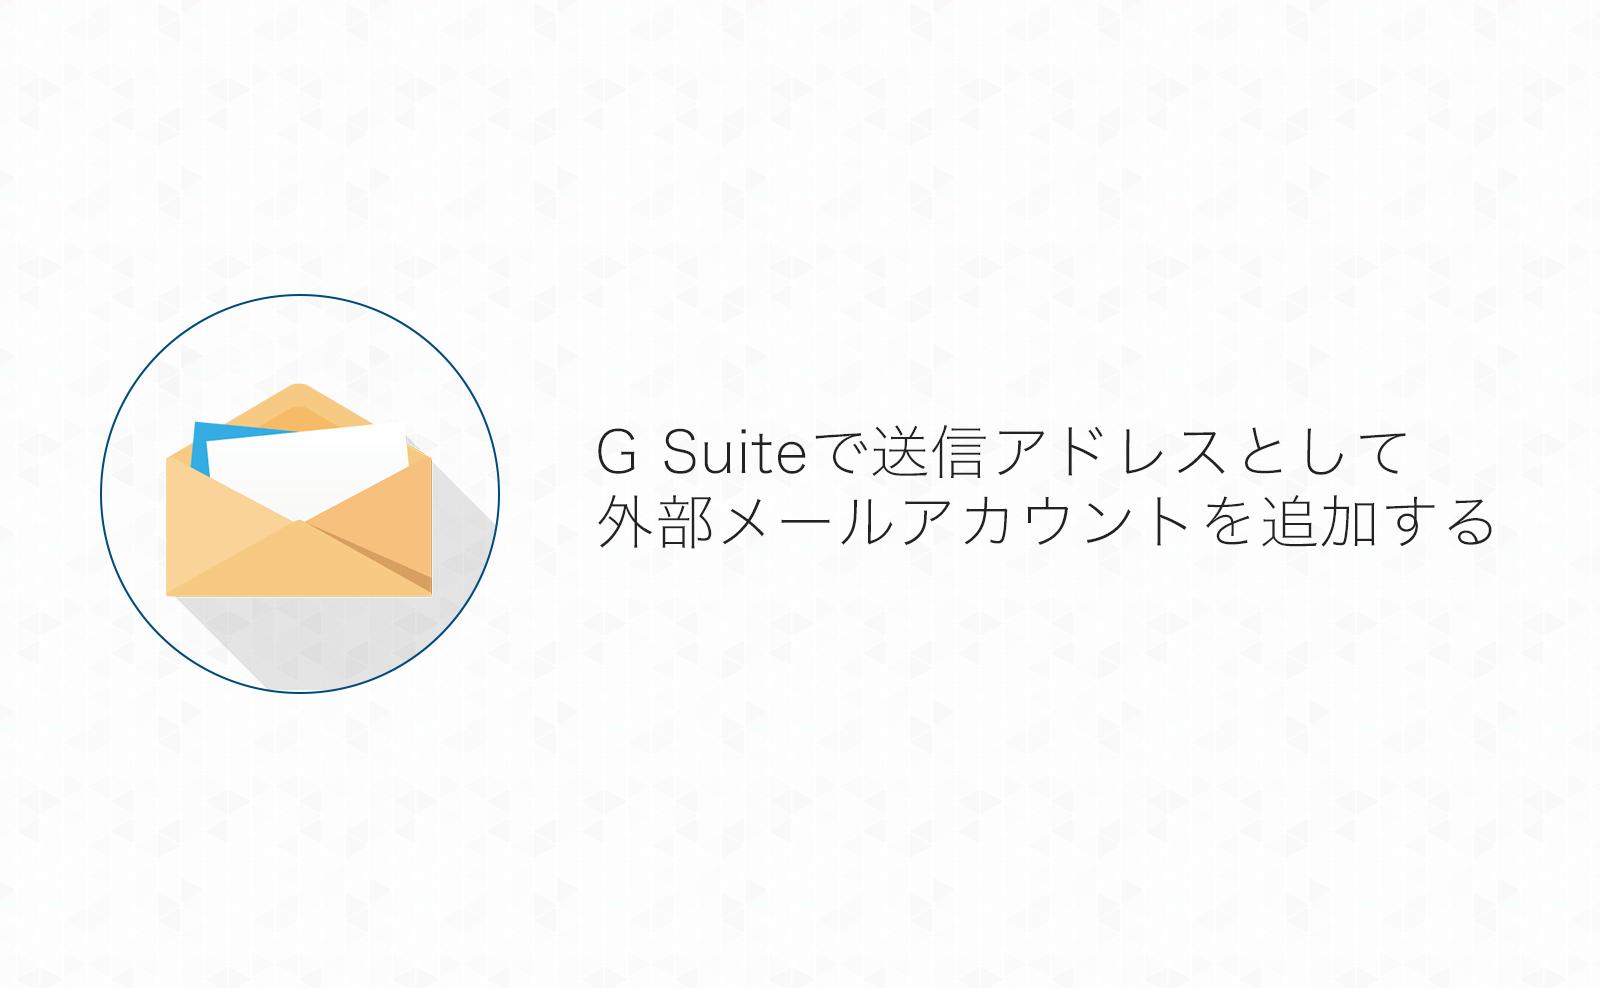 G SuiteのGmailで外部ドメインのメールアカウントを追加出来ない時の対処方法